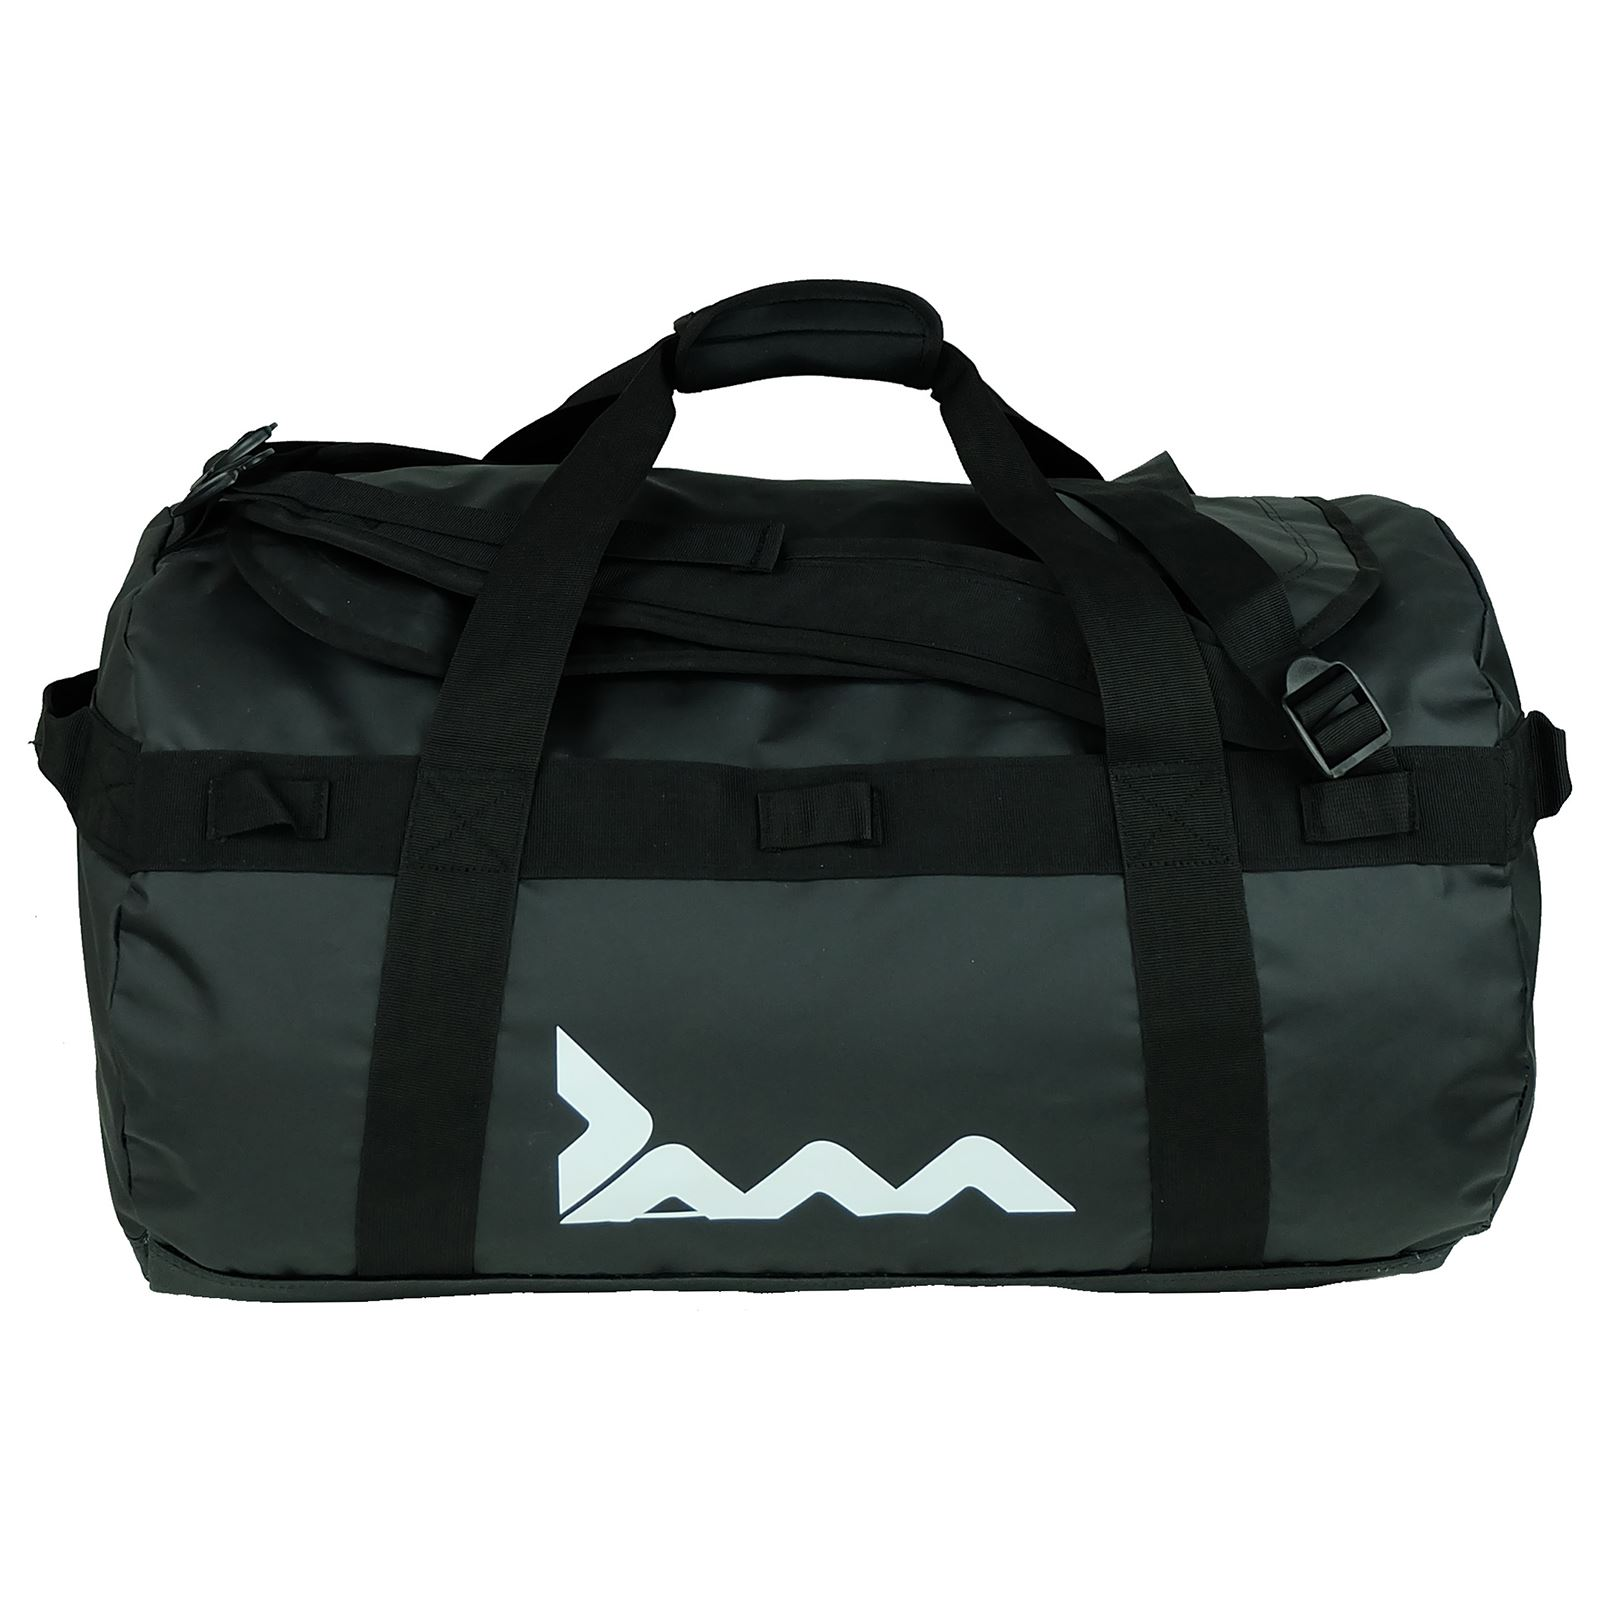 c2aef66a97 Cargo Duffle Bag Waterproof Holdall Sports Gym Training Camping ...